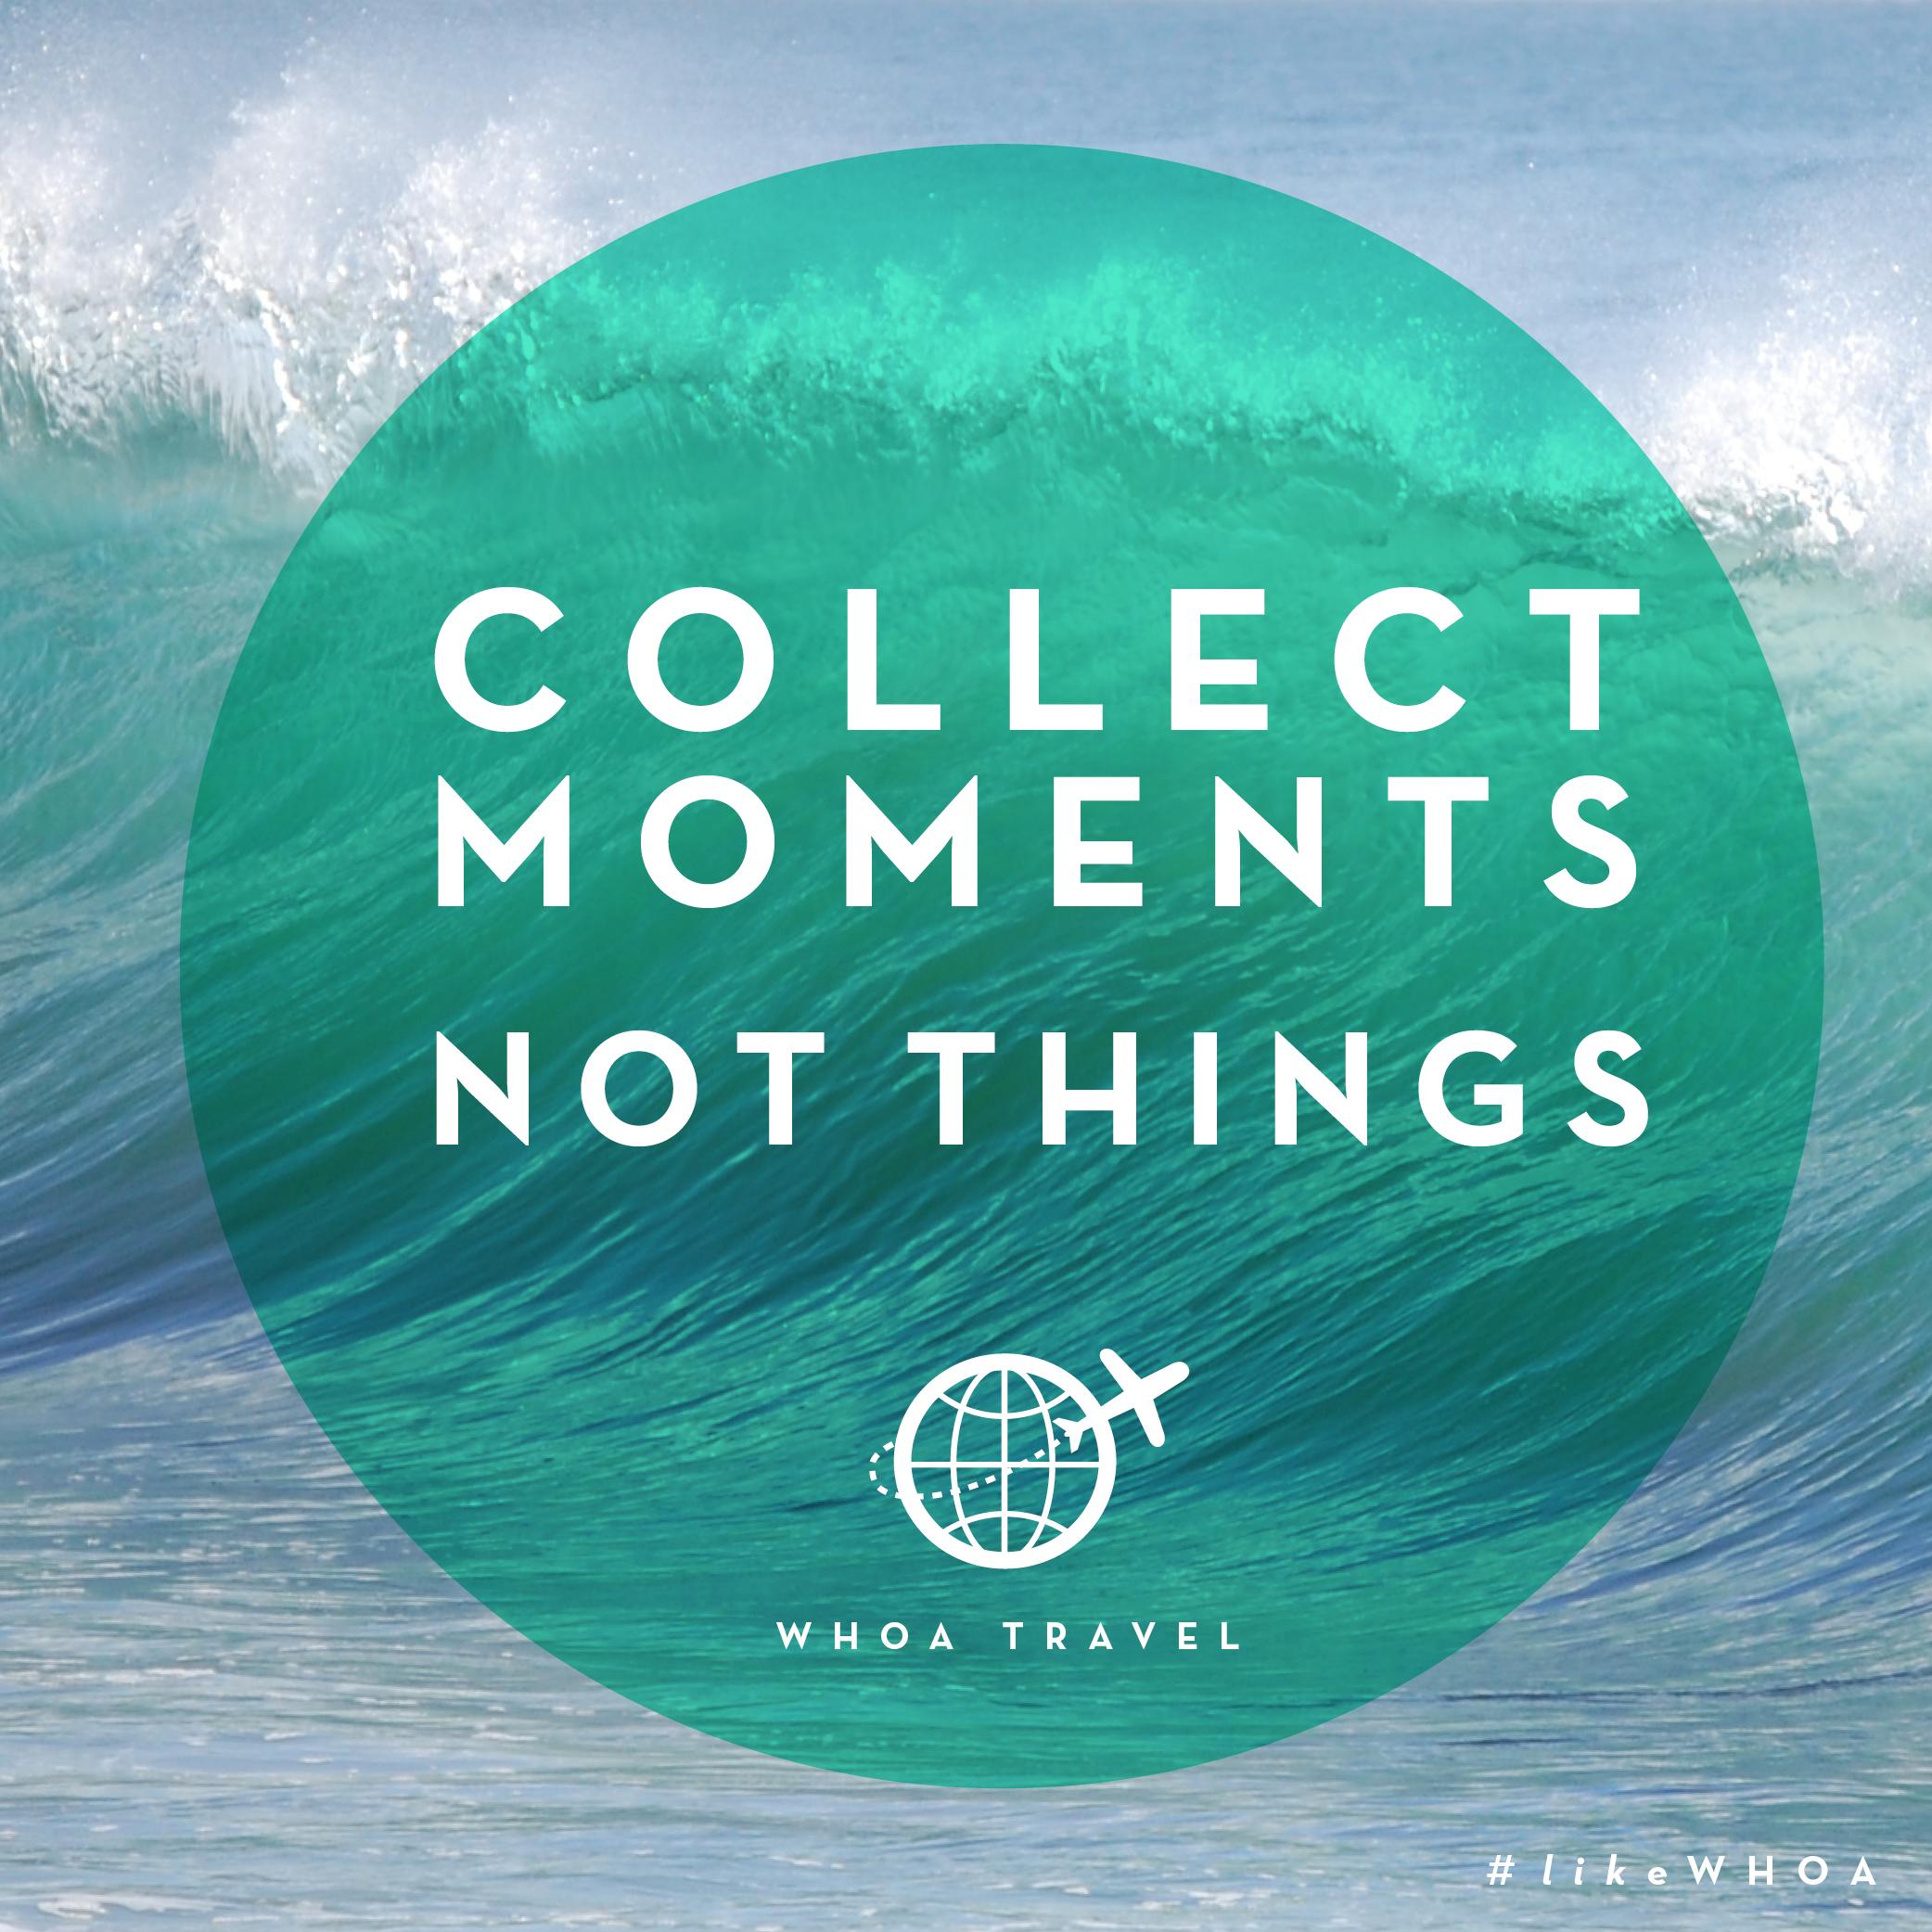 WHOA travel inspiration ADVENSPIRATION moments